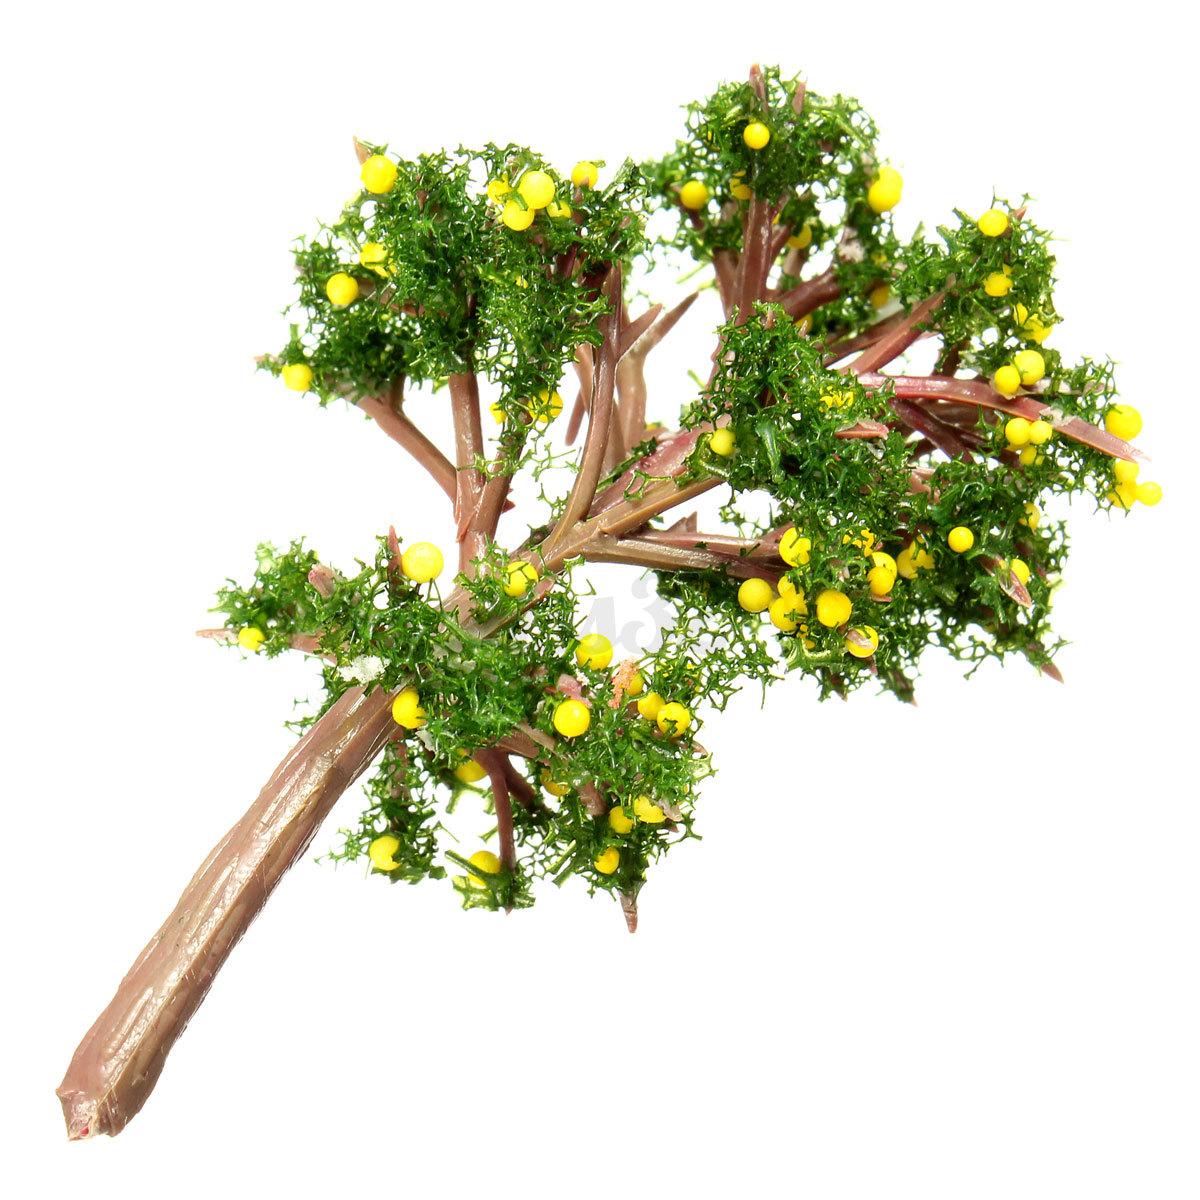 Diy fairy dollhouse garden accessories miniature tree for Garden trees b q